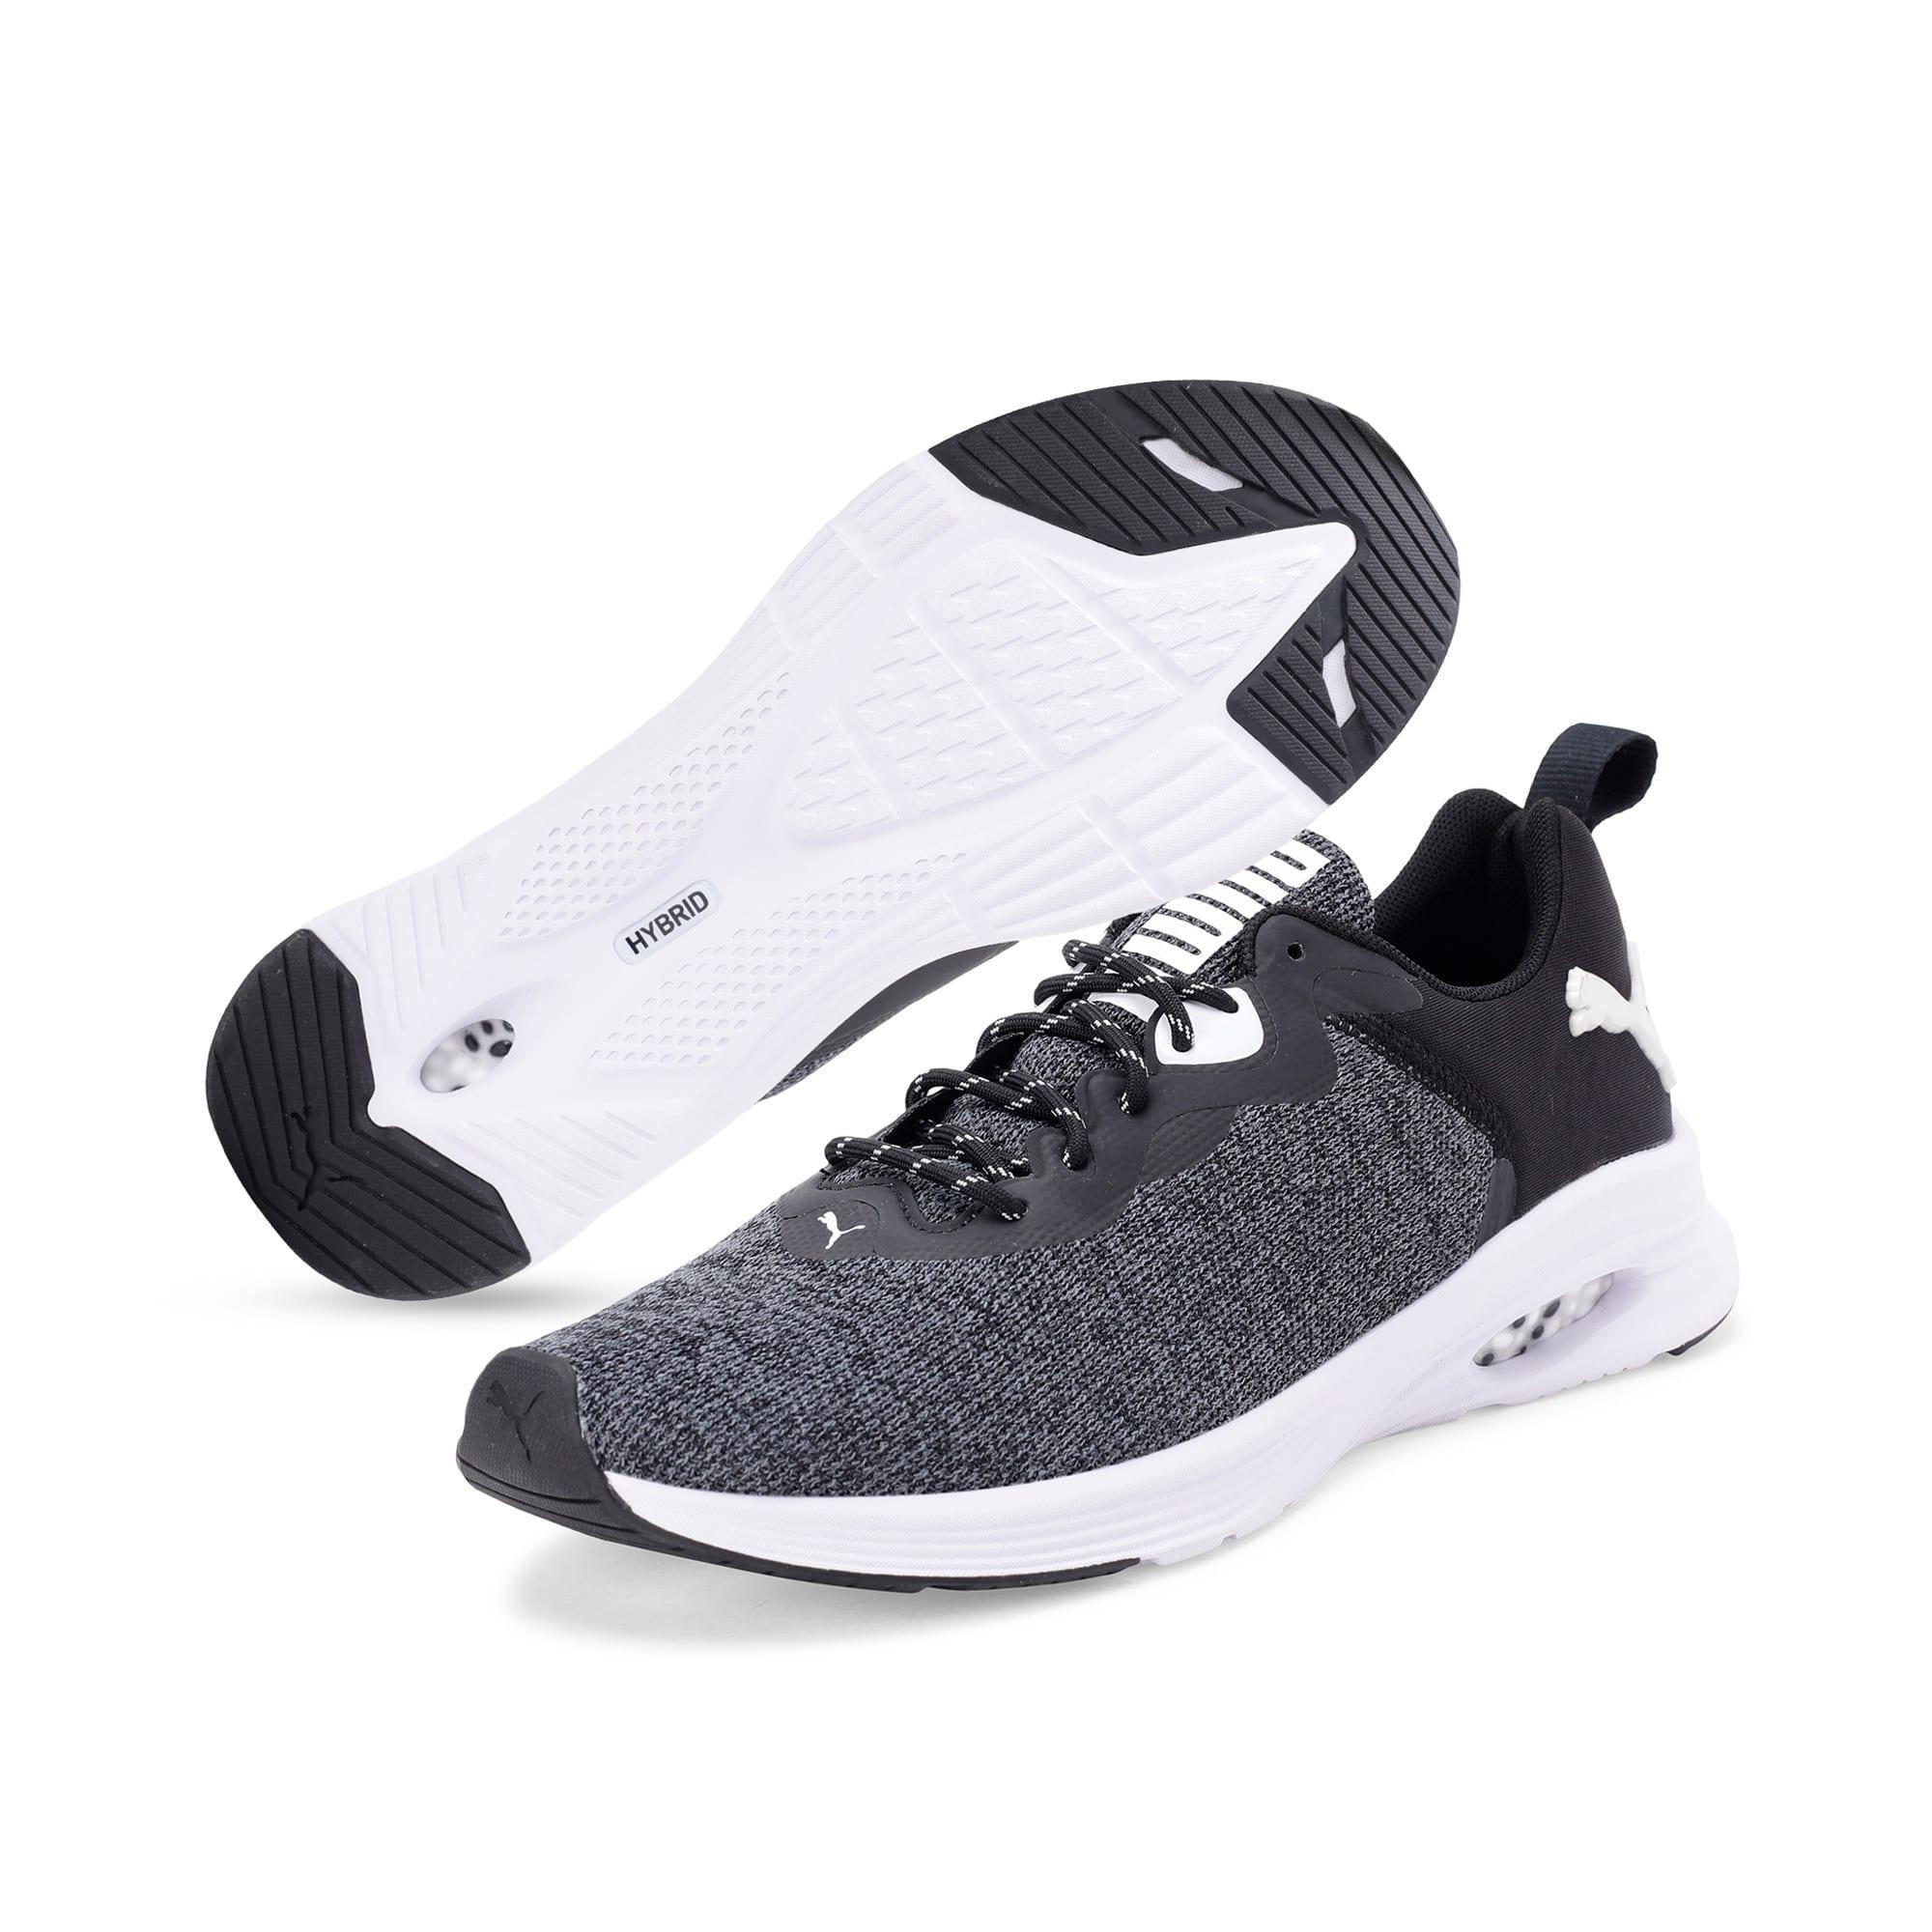 Thumbnail 2 of HYBRID Fuego evoKNIT Men's Running Shoes, CASTLEROCK-Puma Blk-Pma Wht, medium-IND